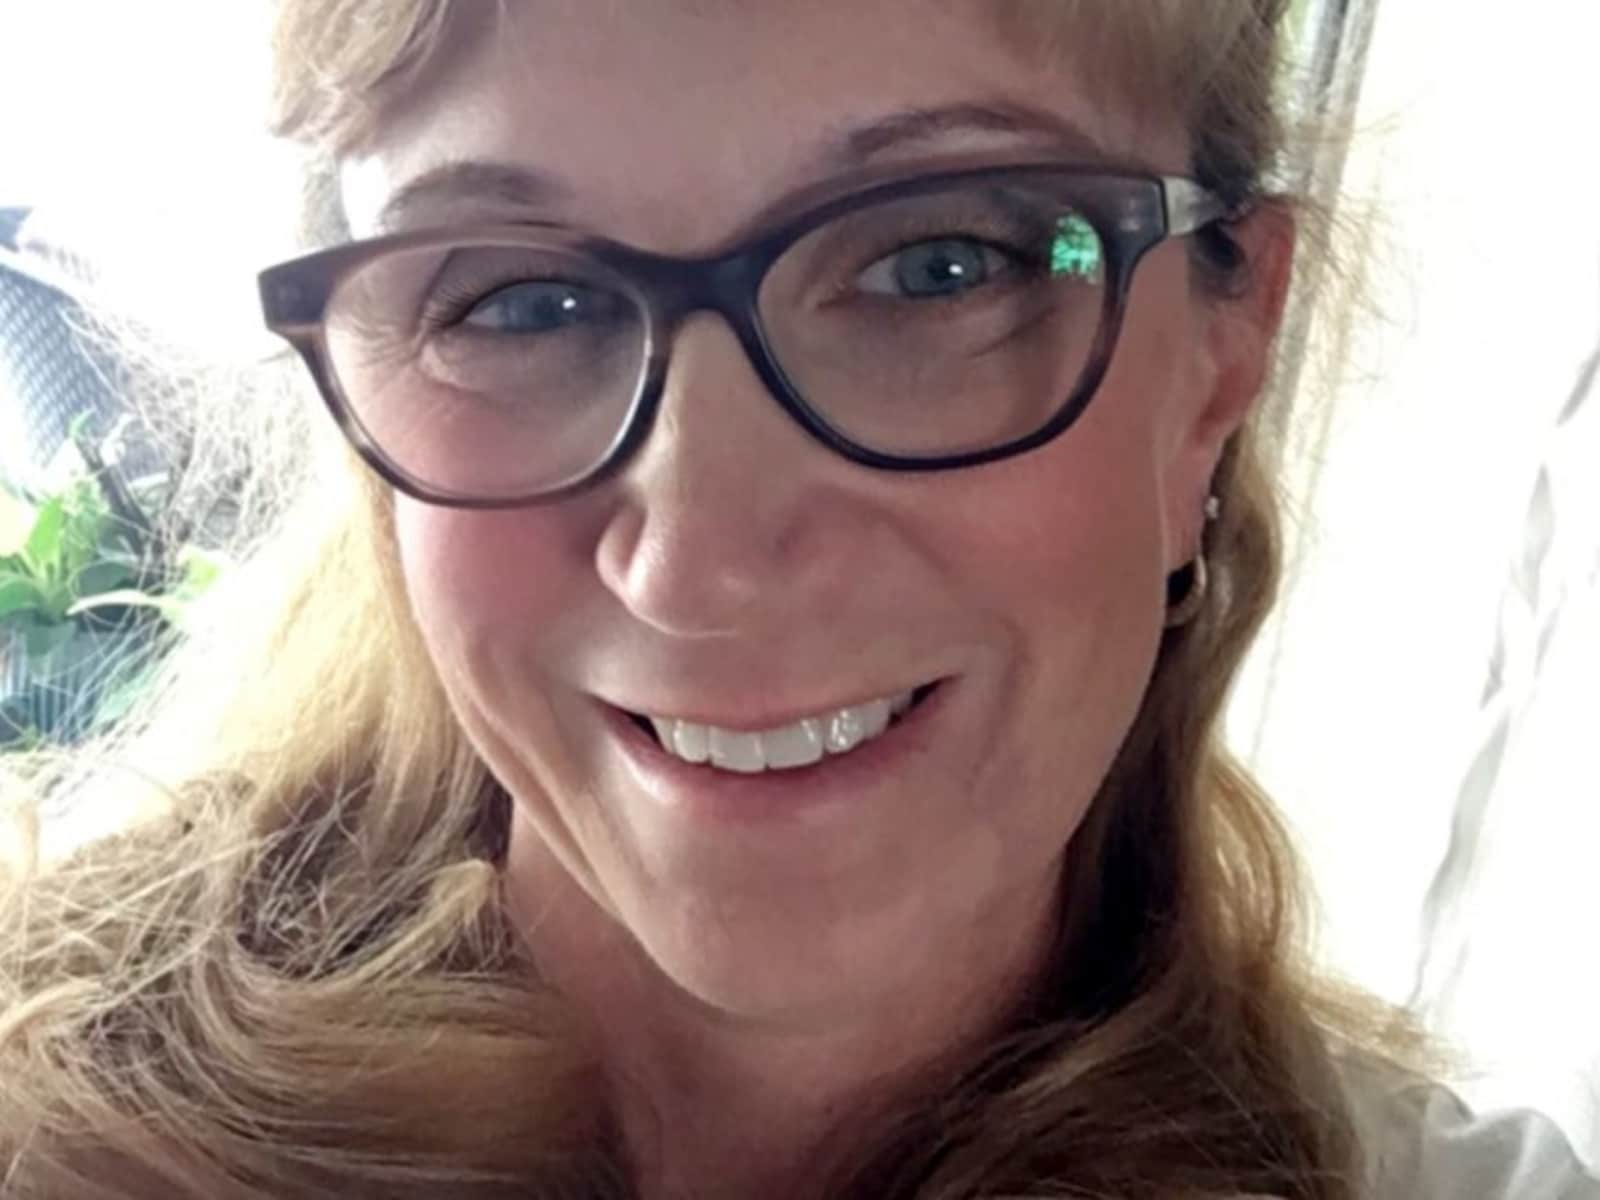 Christine from Daytona Beach, Florida, United States